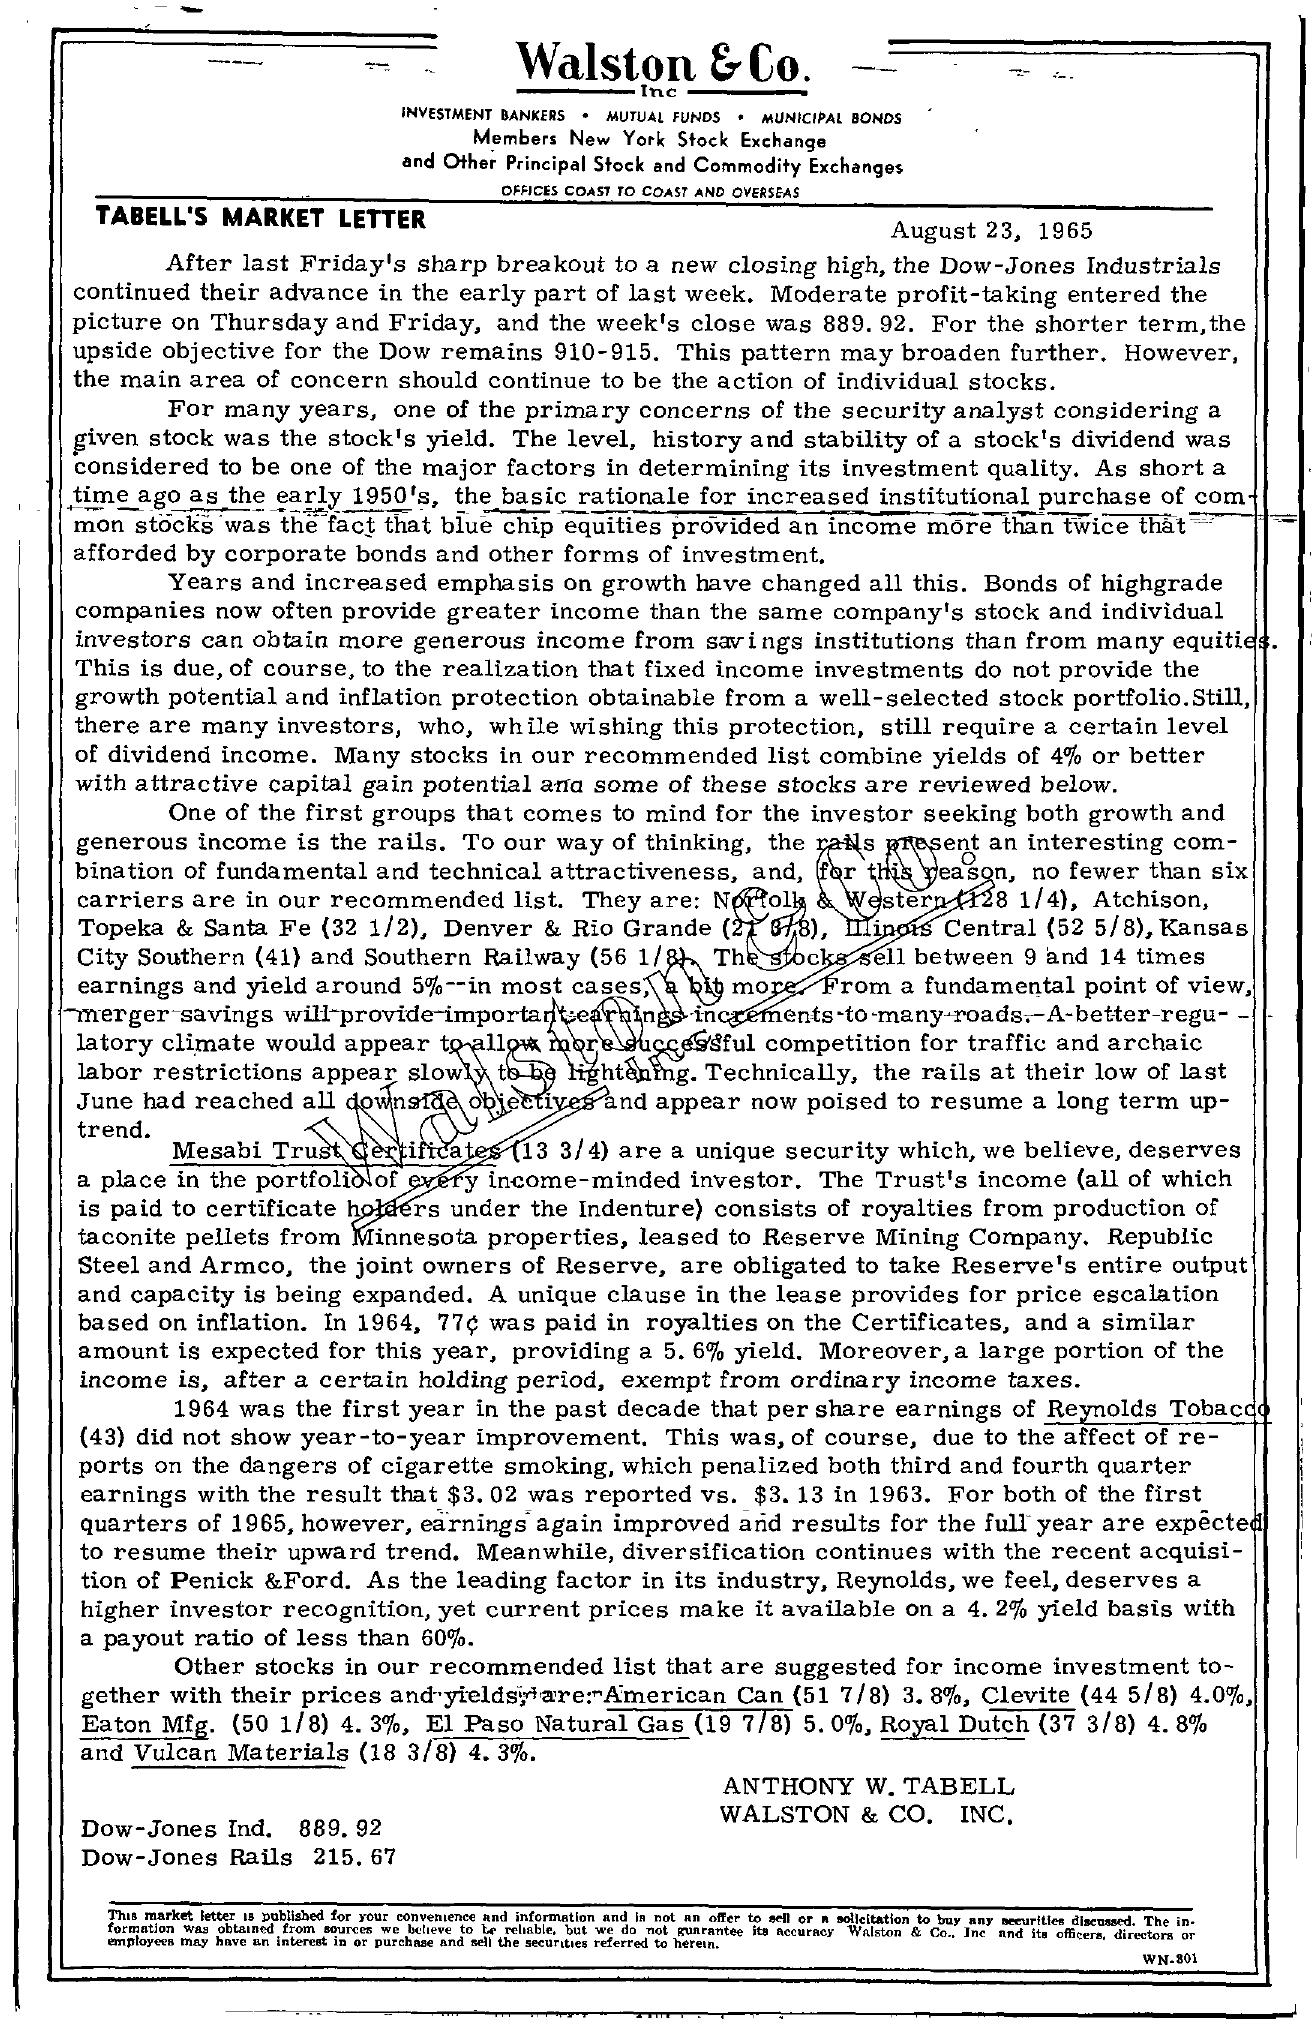 Tabell's Market Letter - August 23, 1965